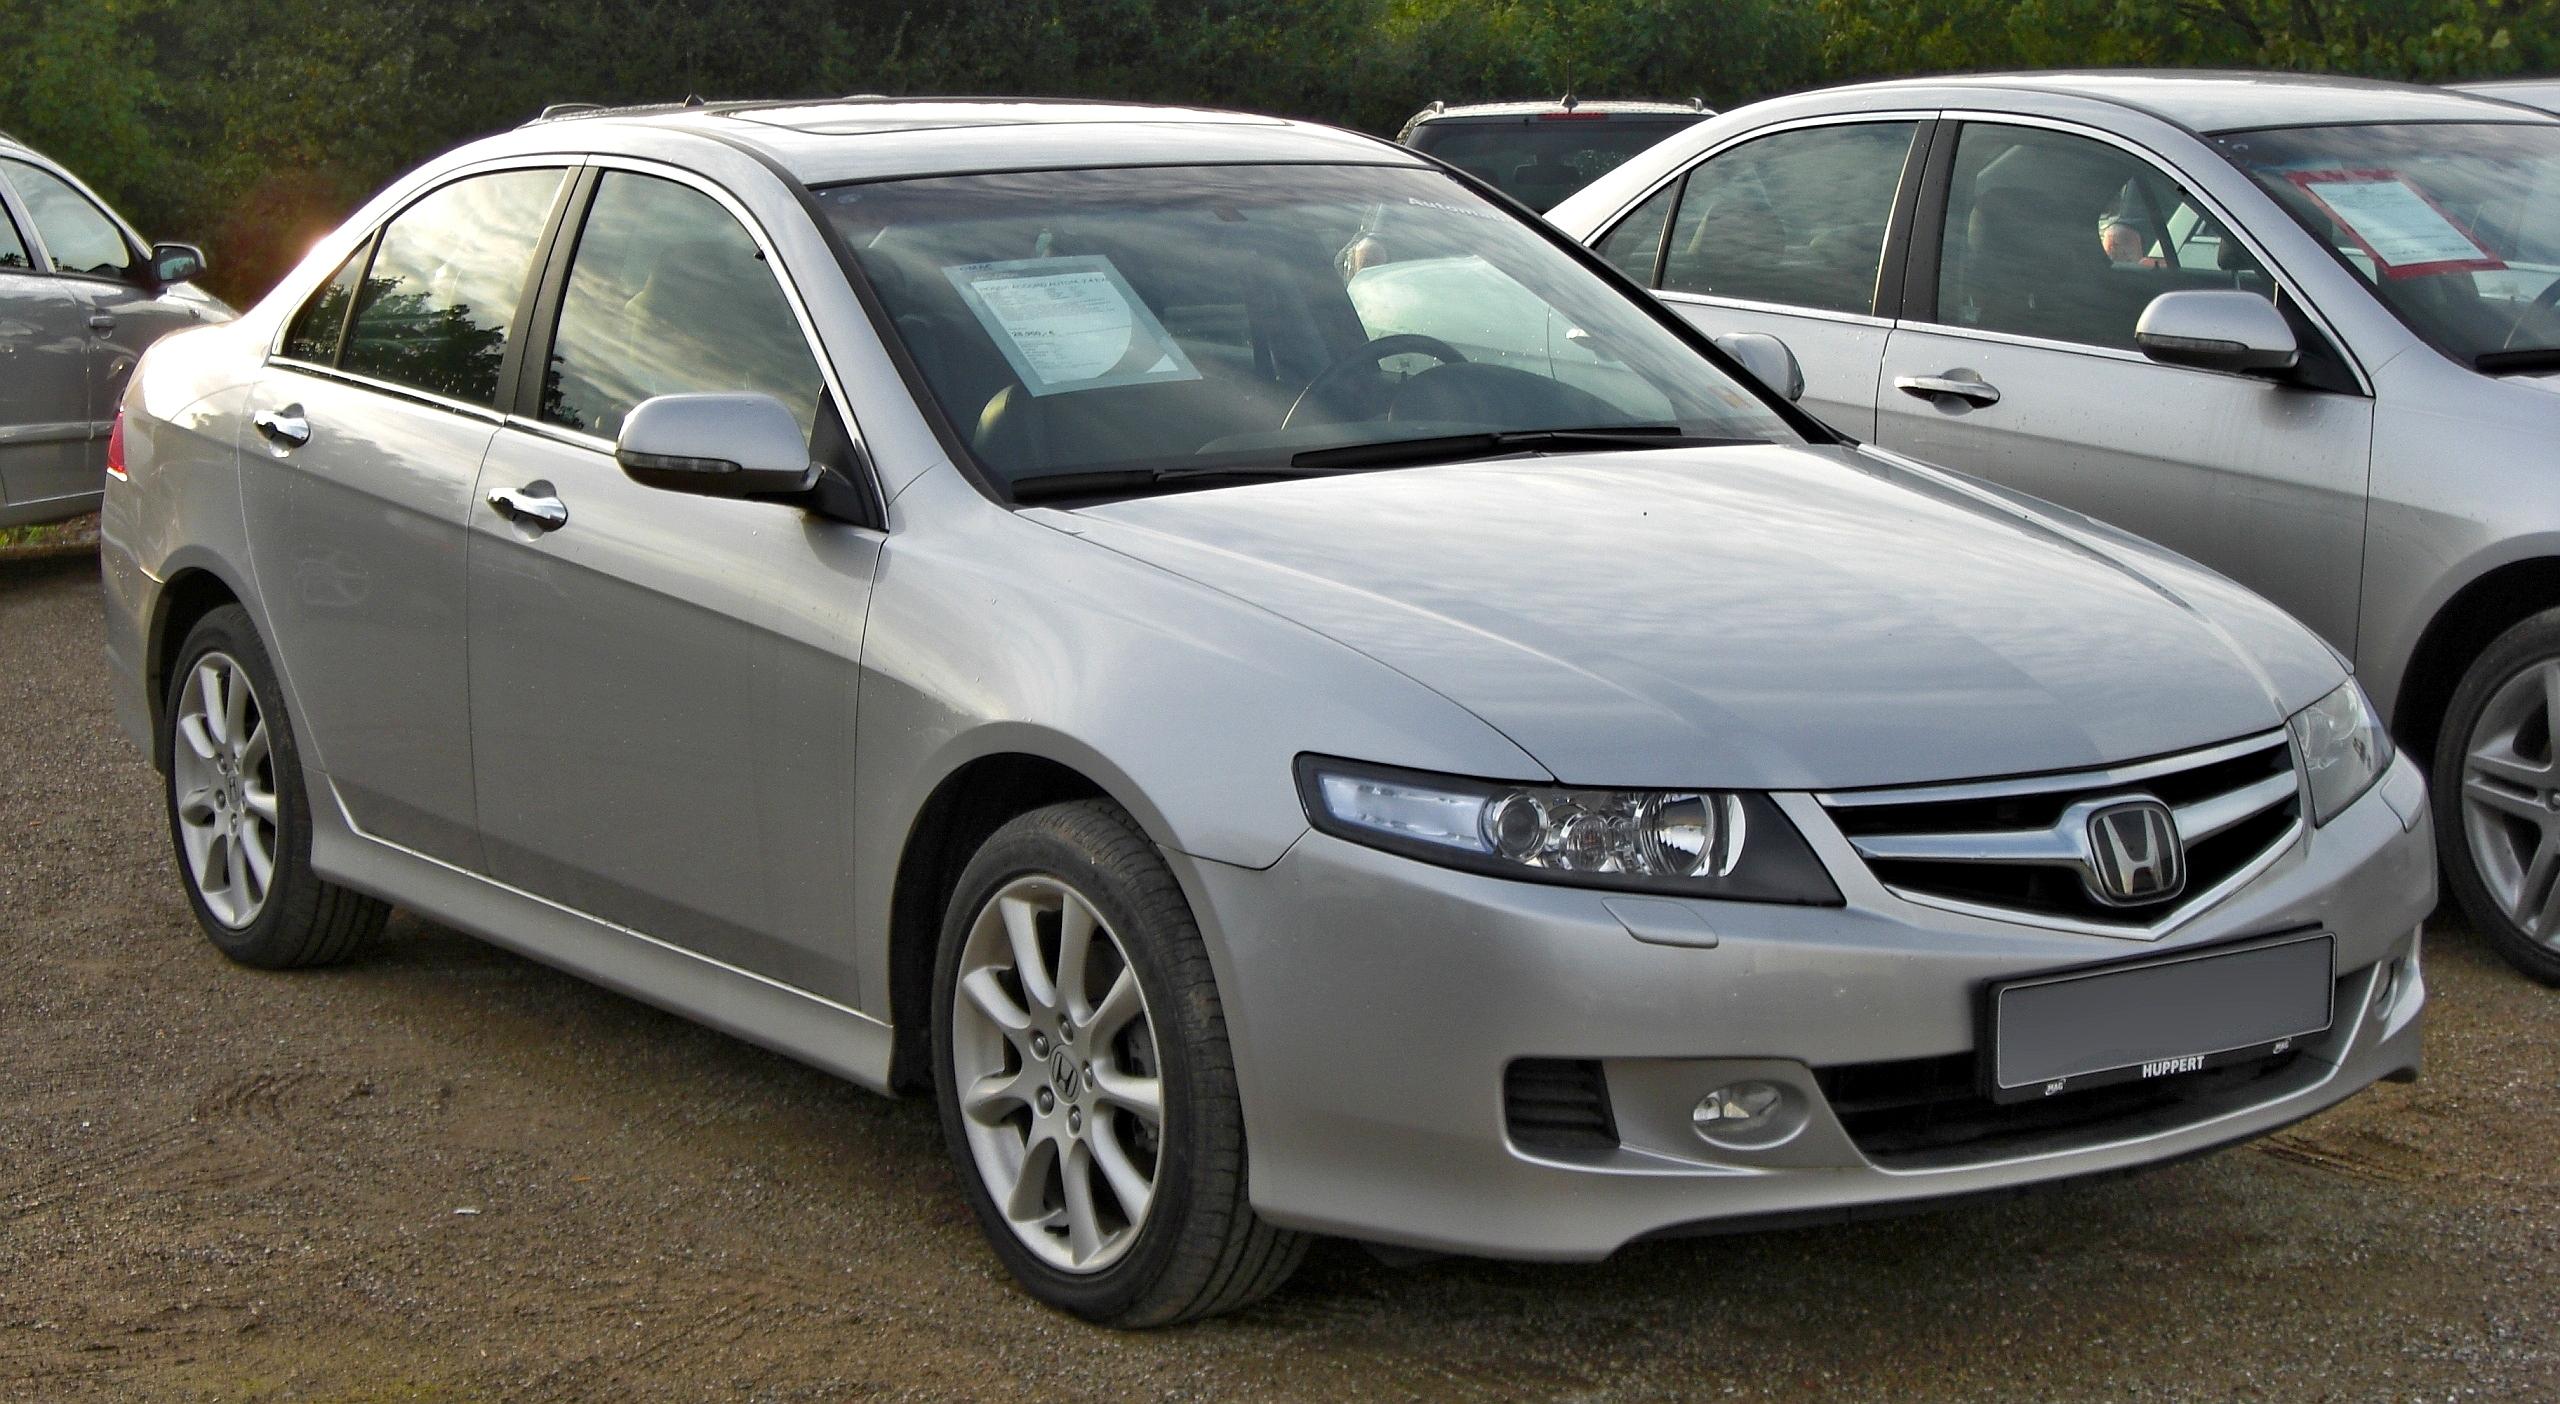 File:Honda Accord 2.4i Facelift front-1.JPG - Wikimedia Commons